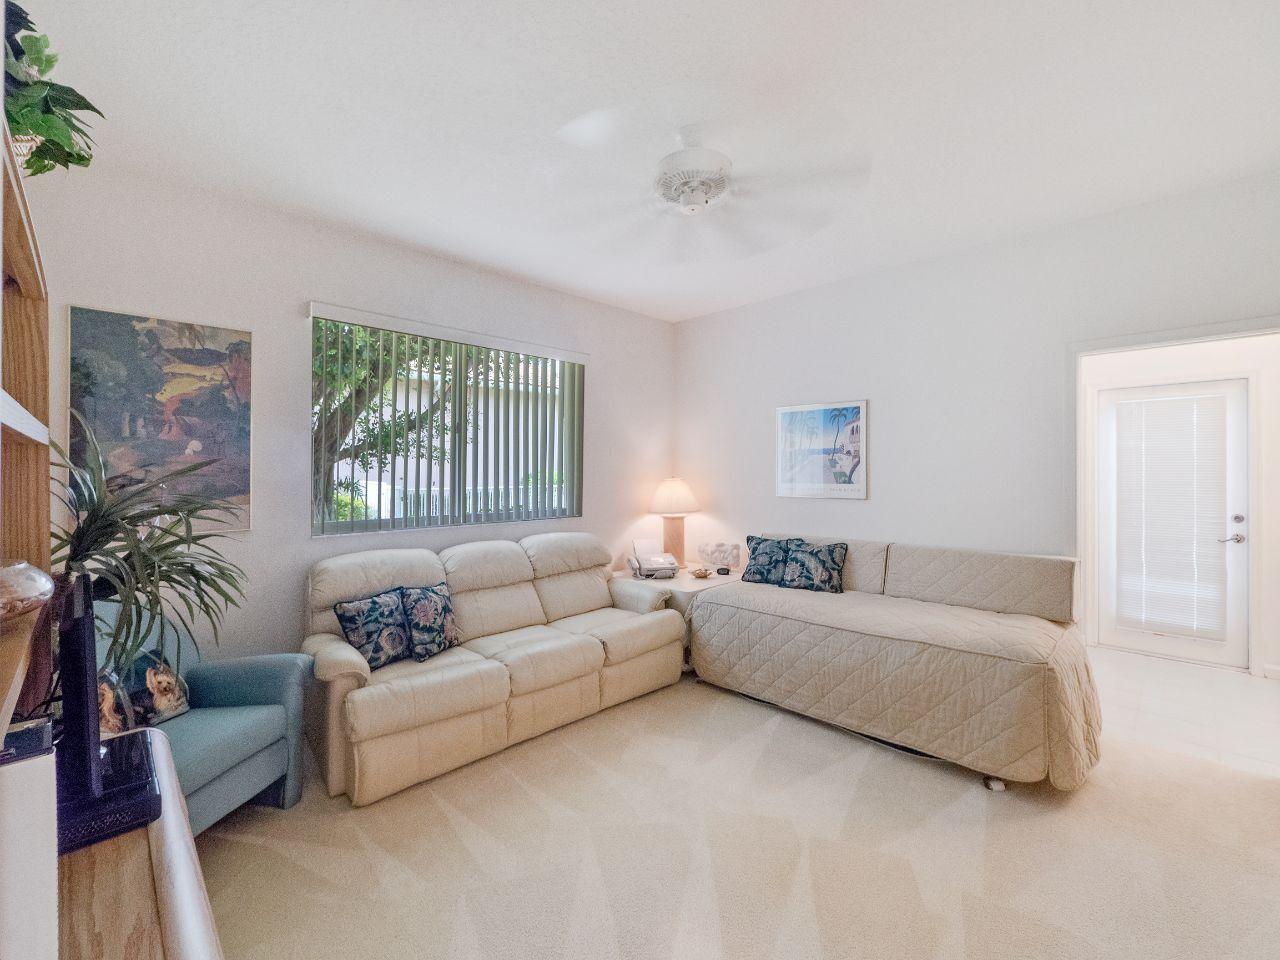 7779 Ironhorse Boulevard, West Palm Beach, Florida 33412, 3 Bedrooms Bedrooms, ,3 BathroomsBathrooms,A,Single family,Ironhorse,RX-10470964